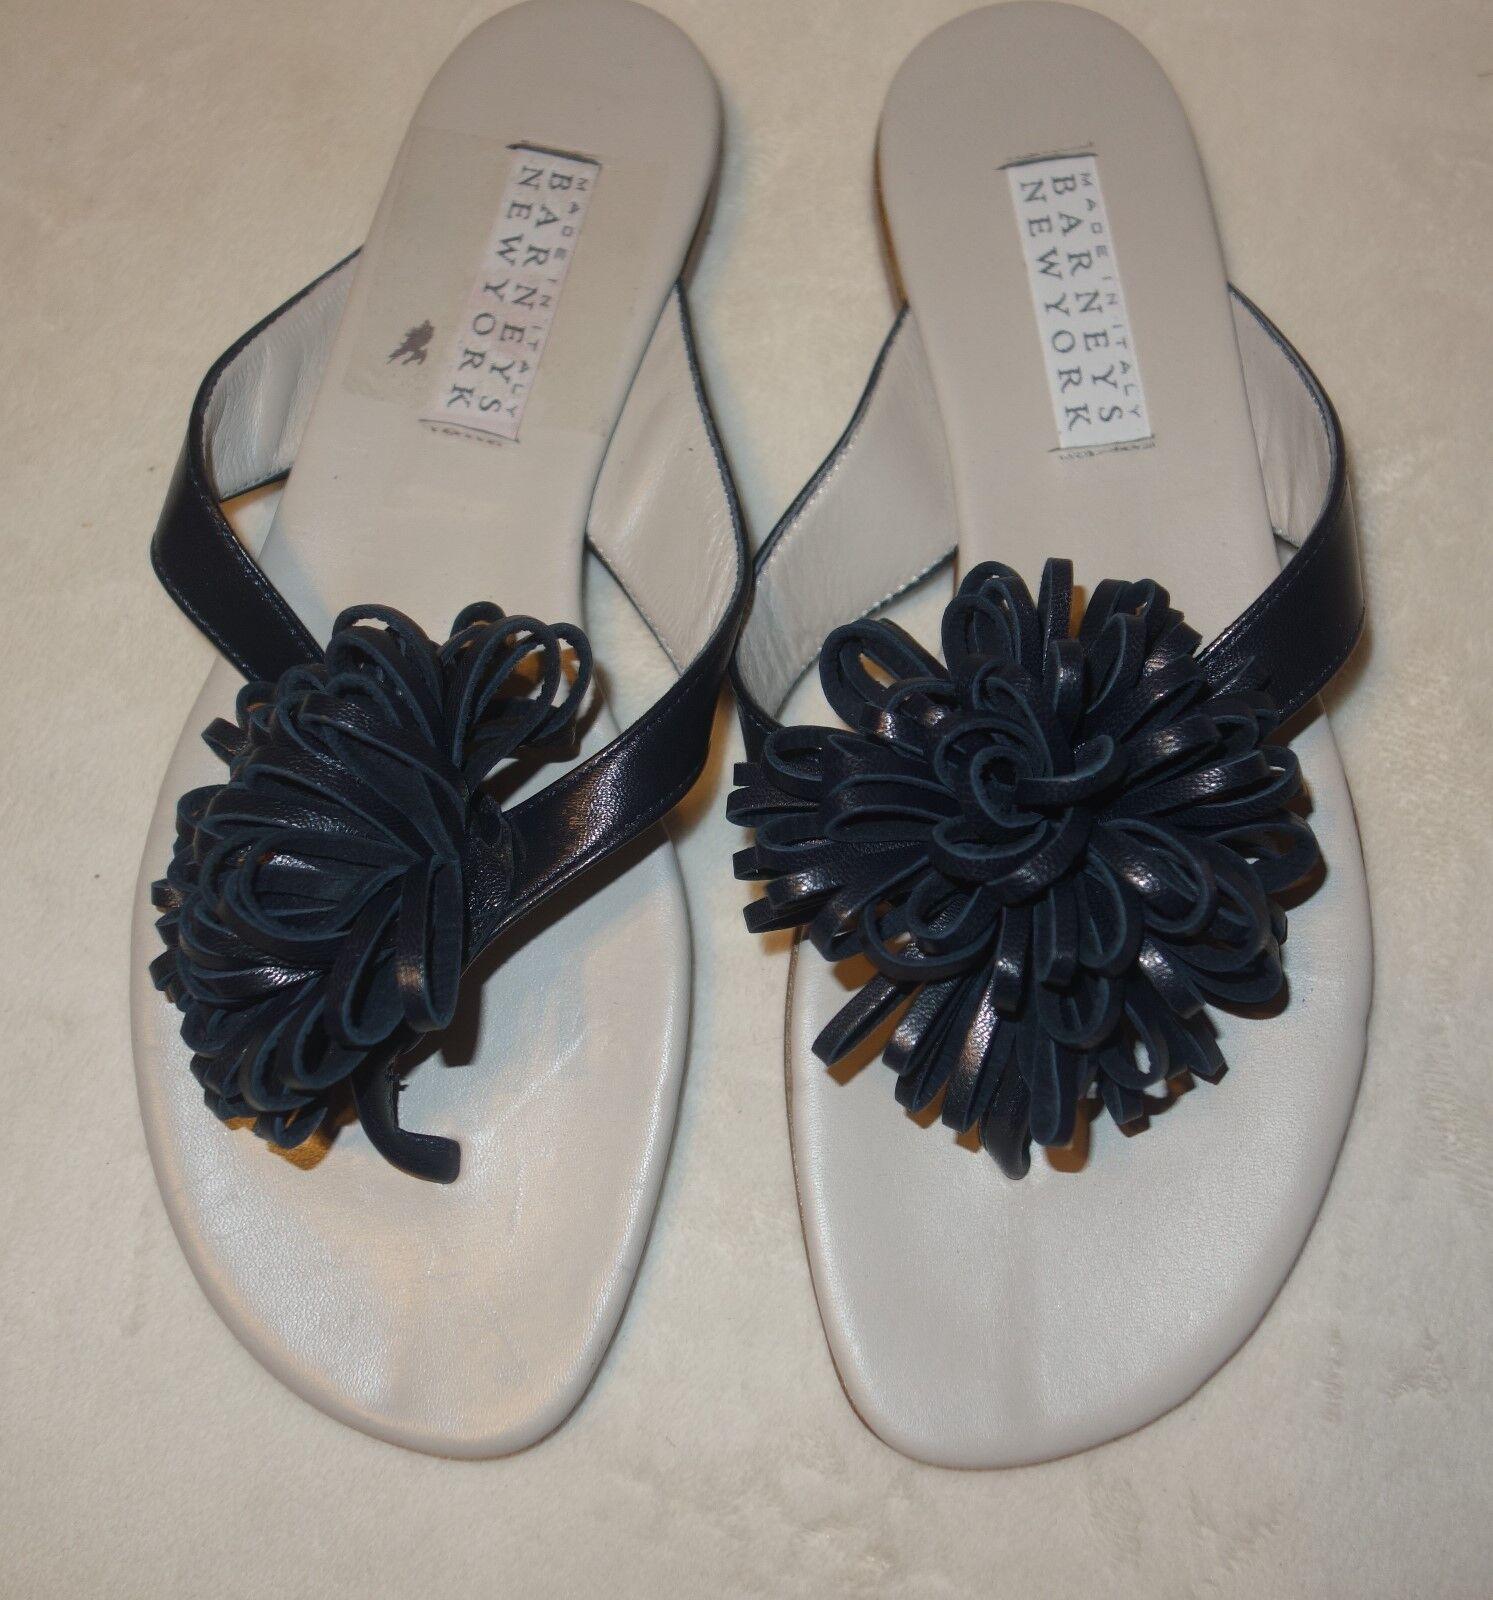 BARNEYS NEW YORK Navy Thong Flat Sandals Size 37.5